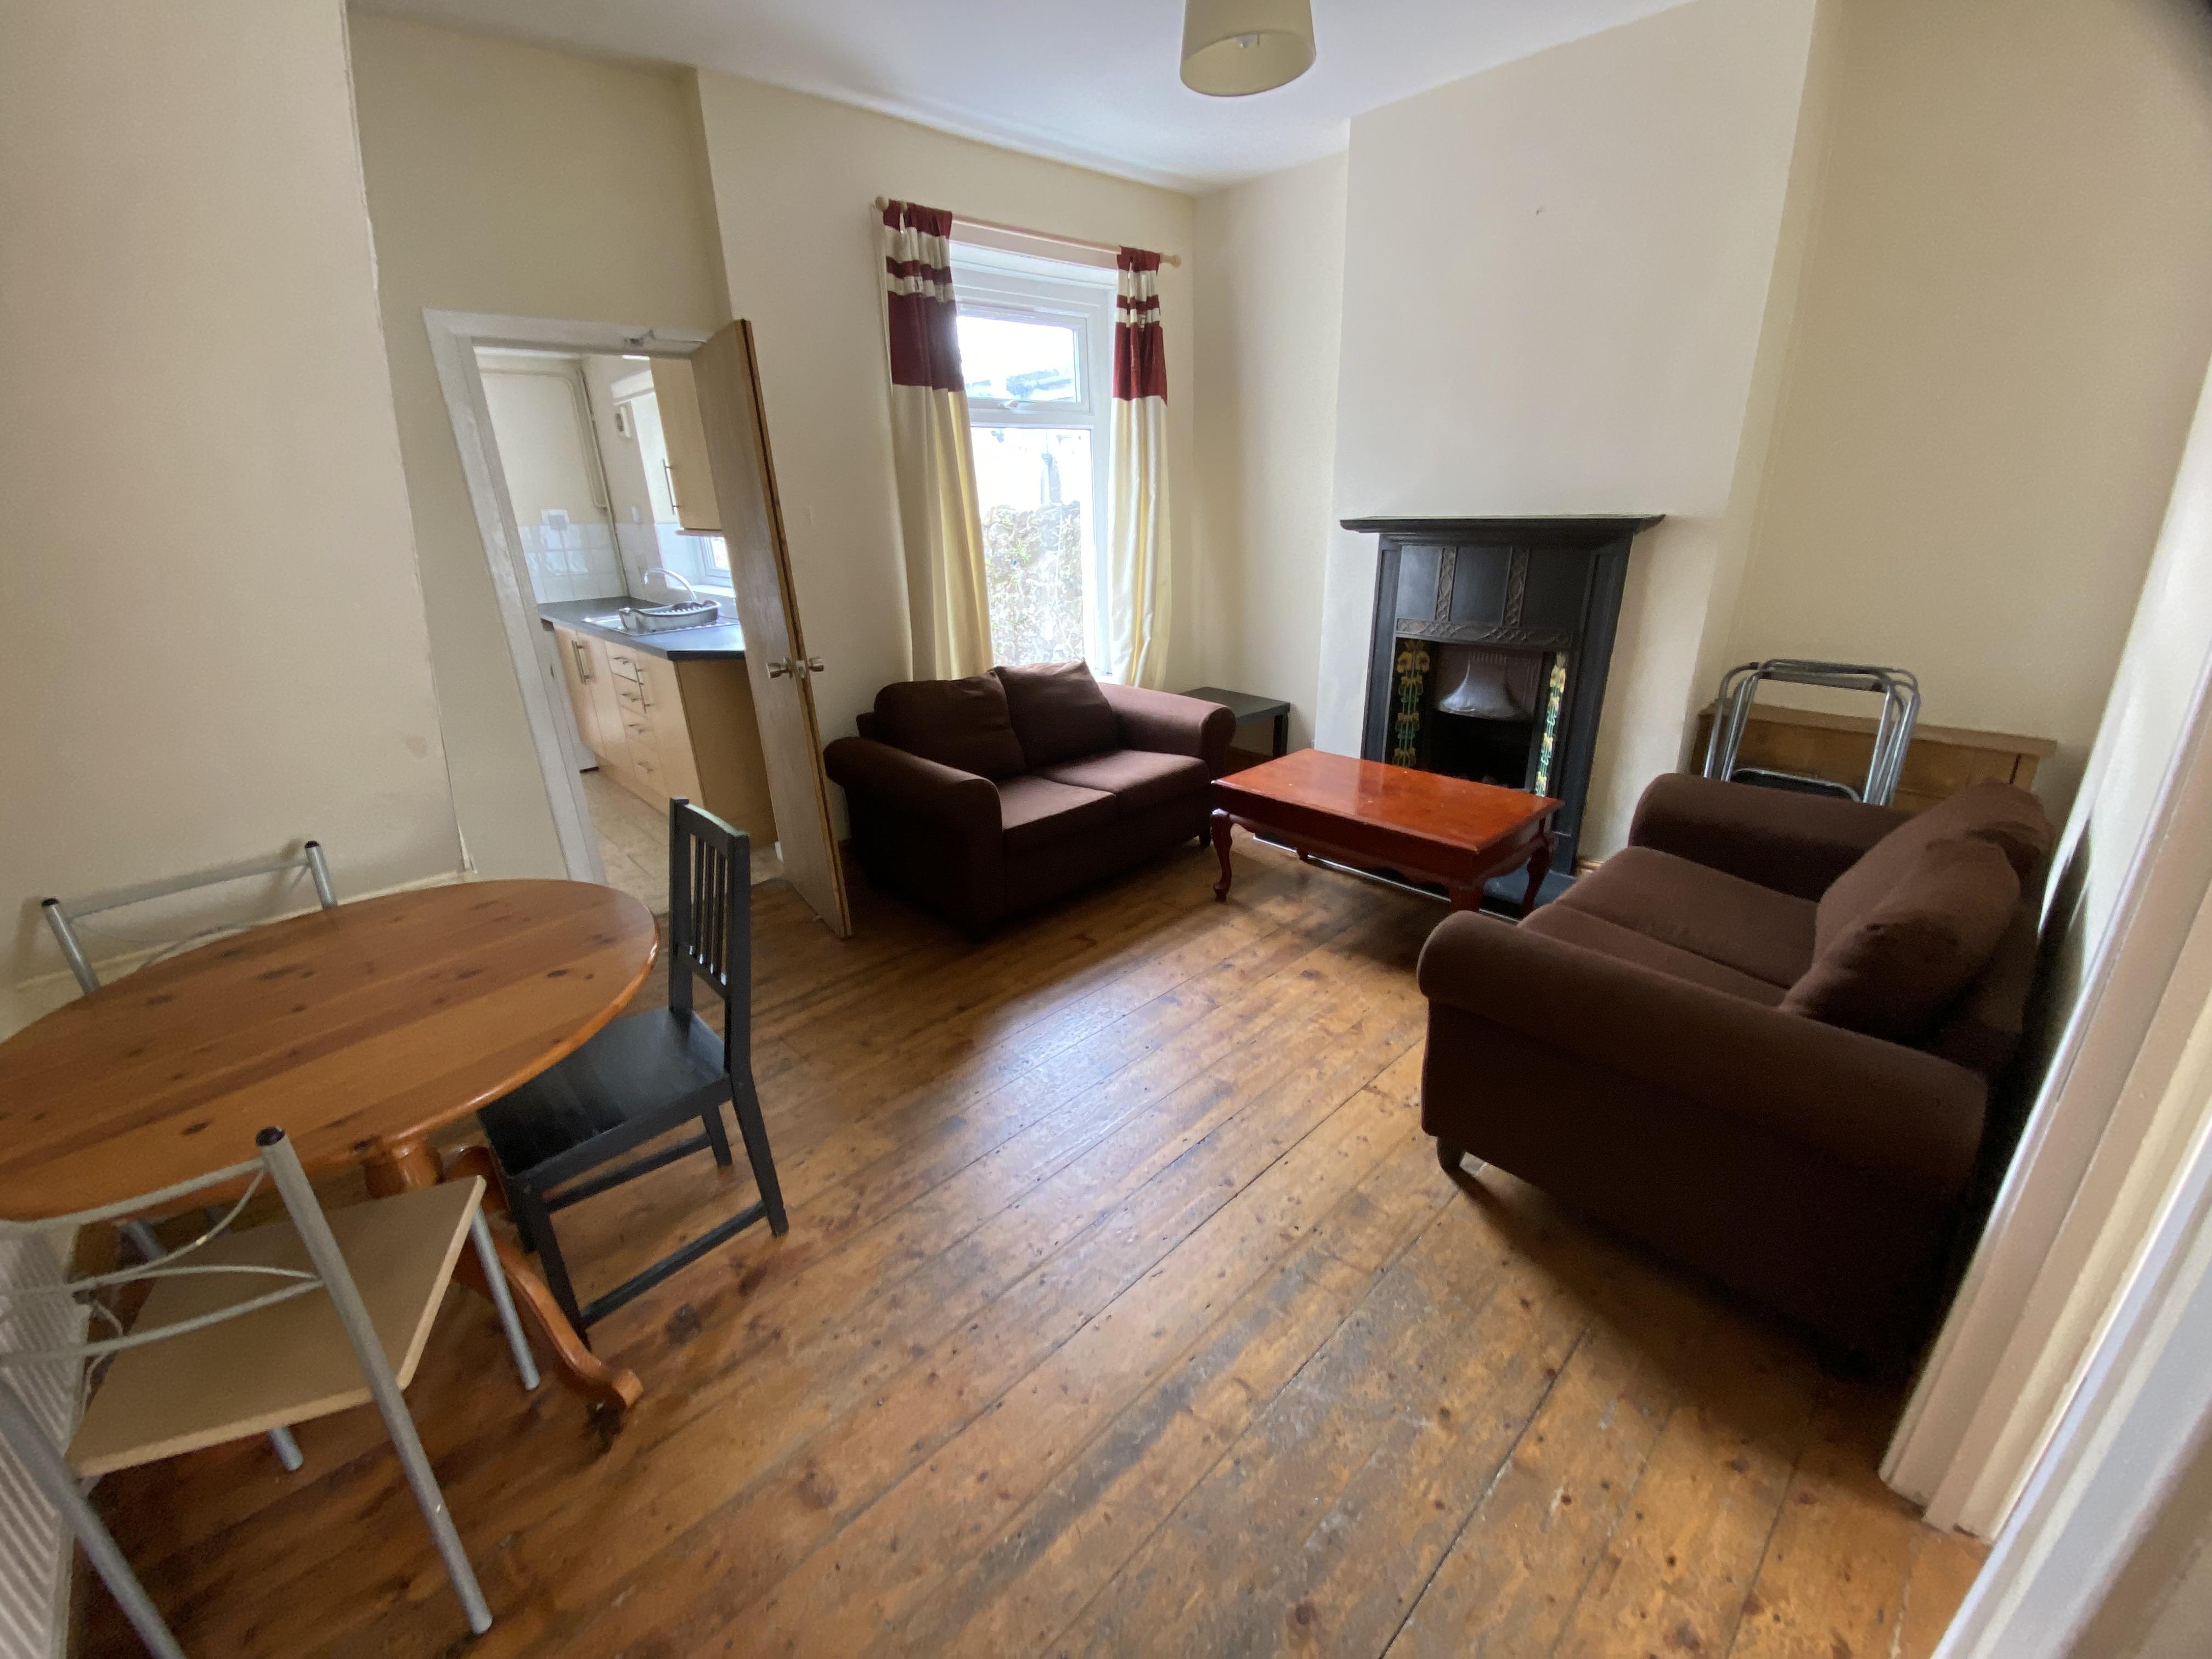 Treherbert Street, Cathays, Cardiff